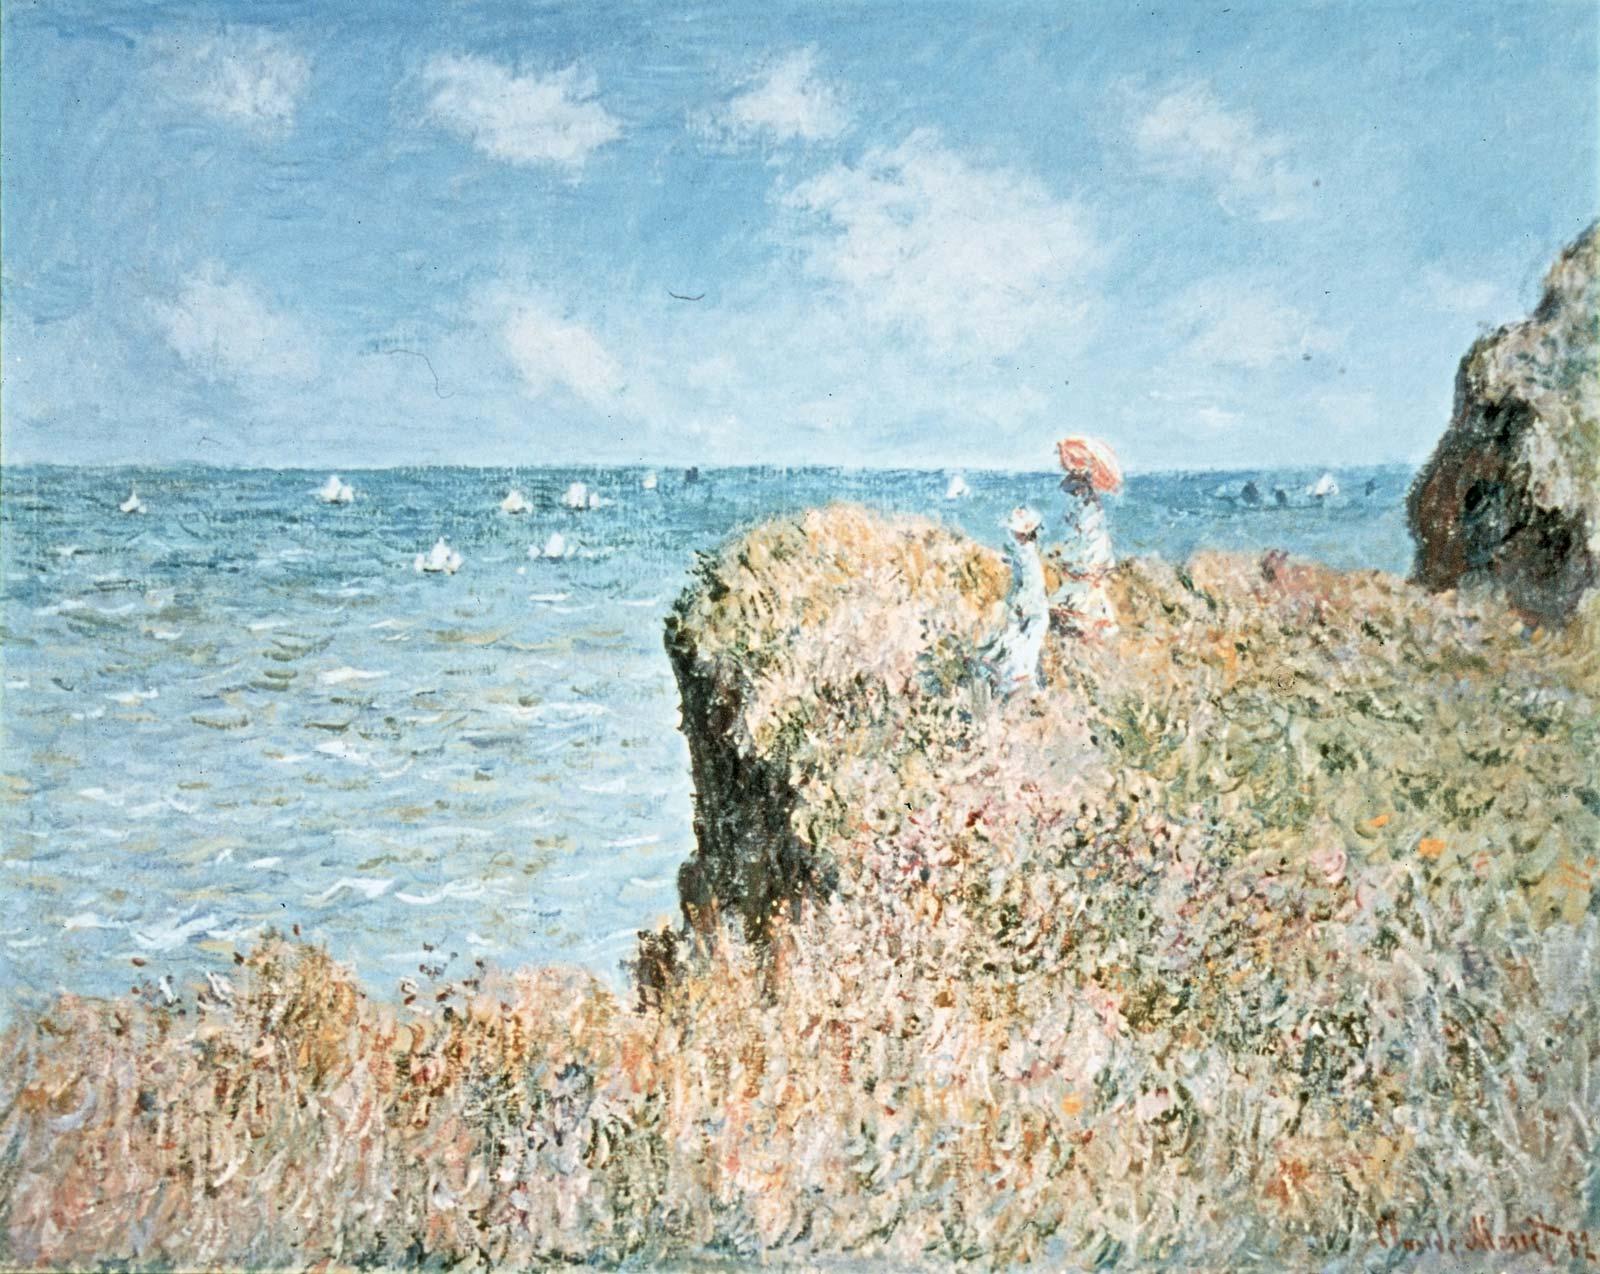 Claude Monet, The Beach at Sainte-Adresse